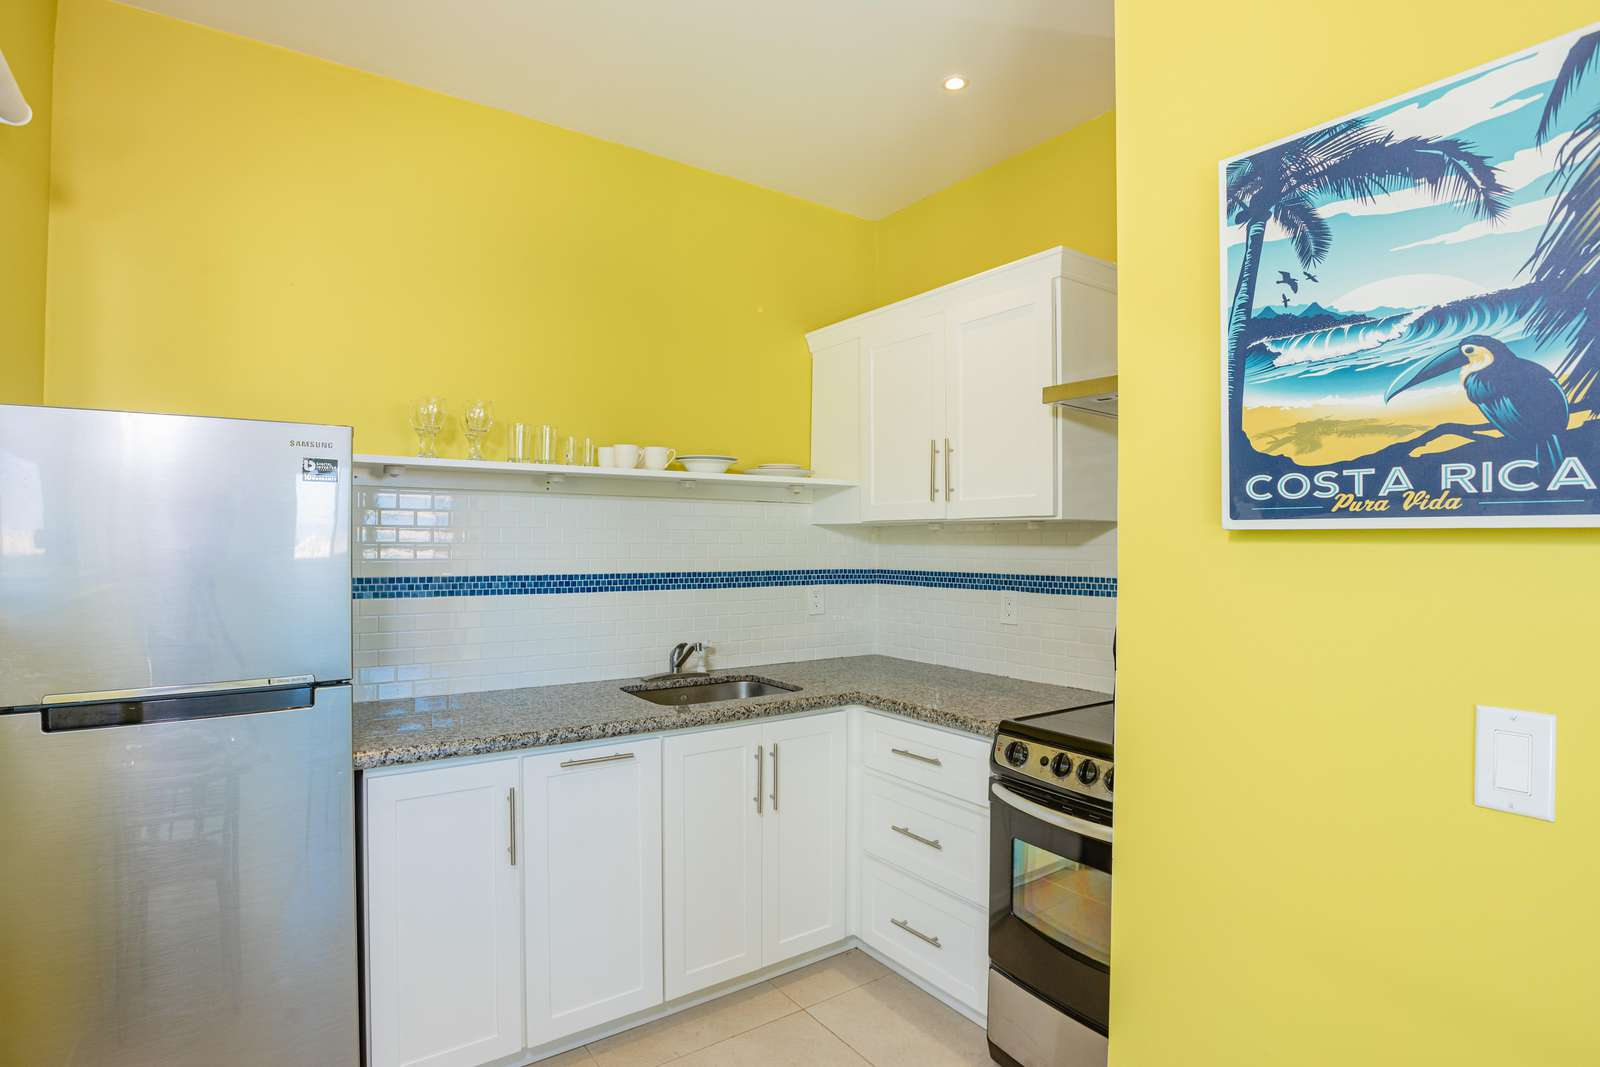 Kitchen area inside the guest casita